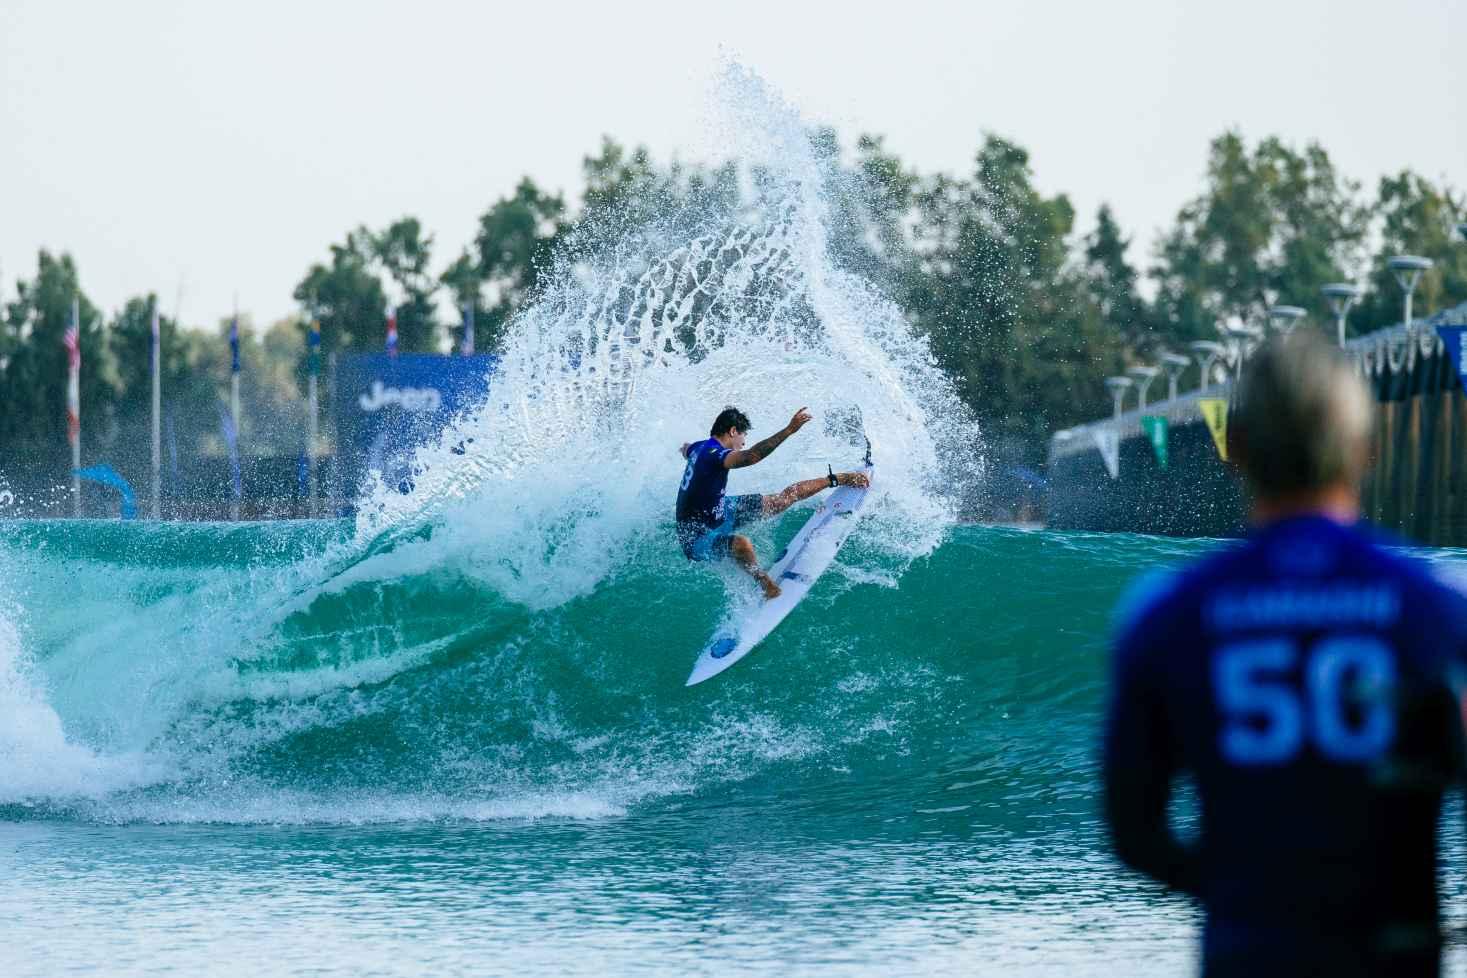 surf30 surf ranch pro 2021 wsl surf Pupo M Ranch21 JVK 2516